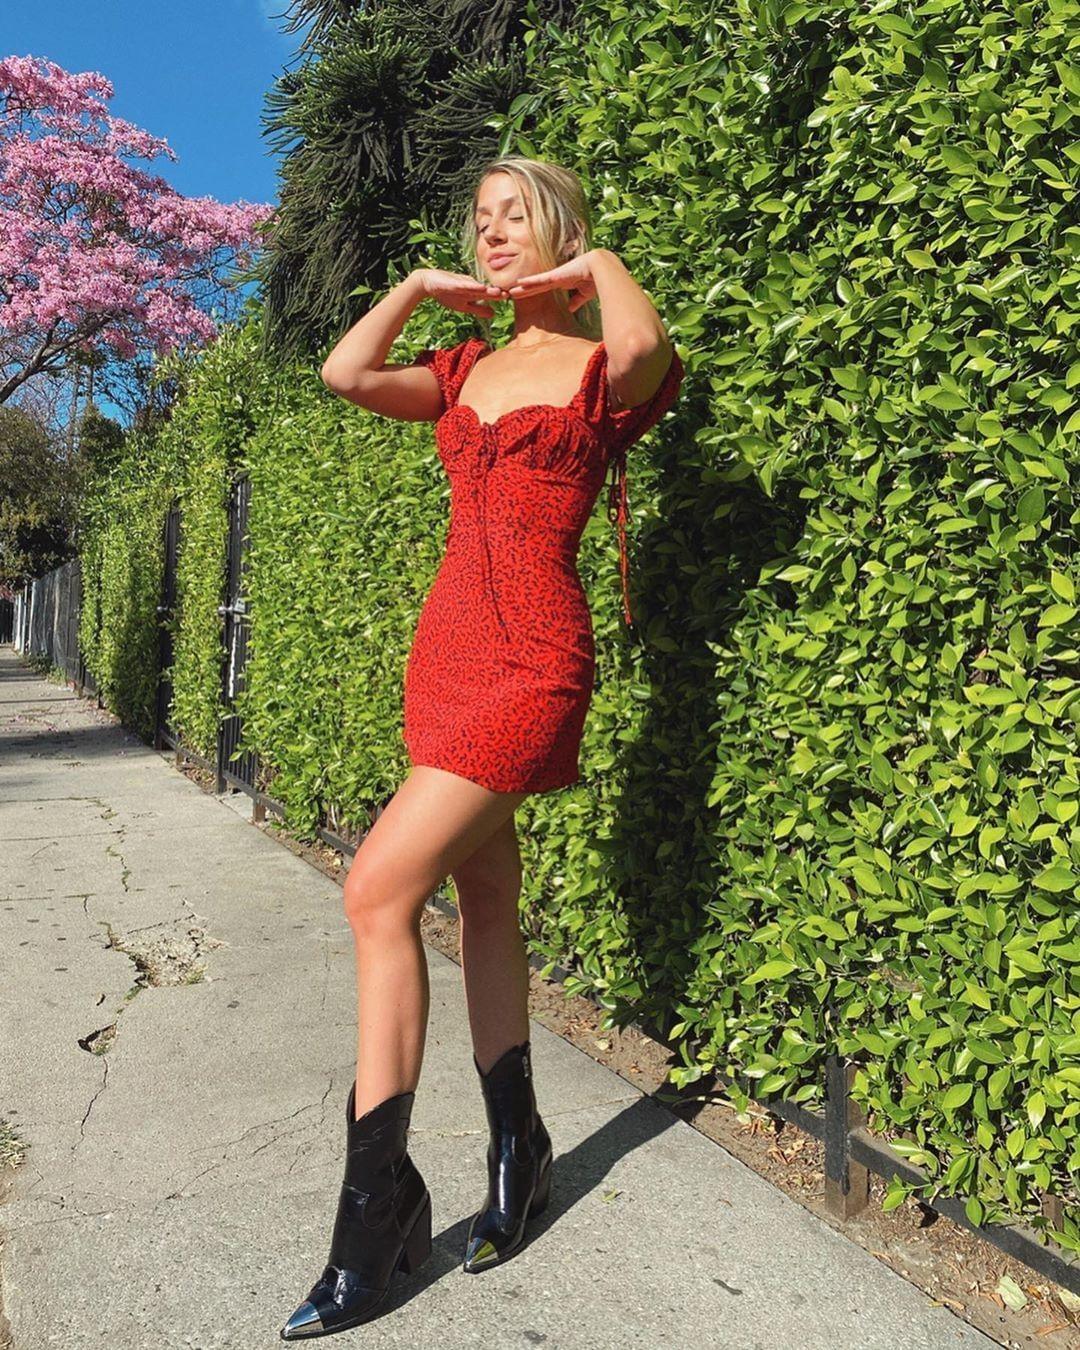 ANOTHER beautiful weekend ahead 🌻  Tap to shop 𝗔𝗦𝗣𝗜𝗥𝗘   #fashion #style #ootd #photooftheday #instagood #instafashion #heels #stylish #shopping #beautiful #outfit #fashionblogger #design #shoestagram #shoelover #instashoes #styles #fashionista #shoeaddict  #blog #lifestyle #inspiration #instadaily #streetstyle #girlboss #model #picoftheday #instastyle